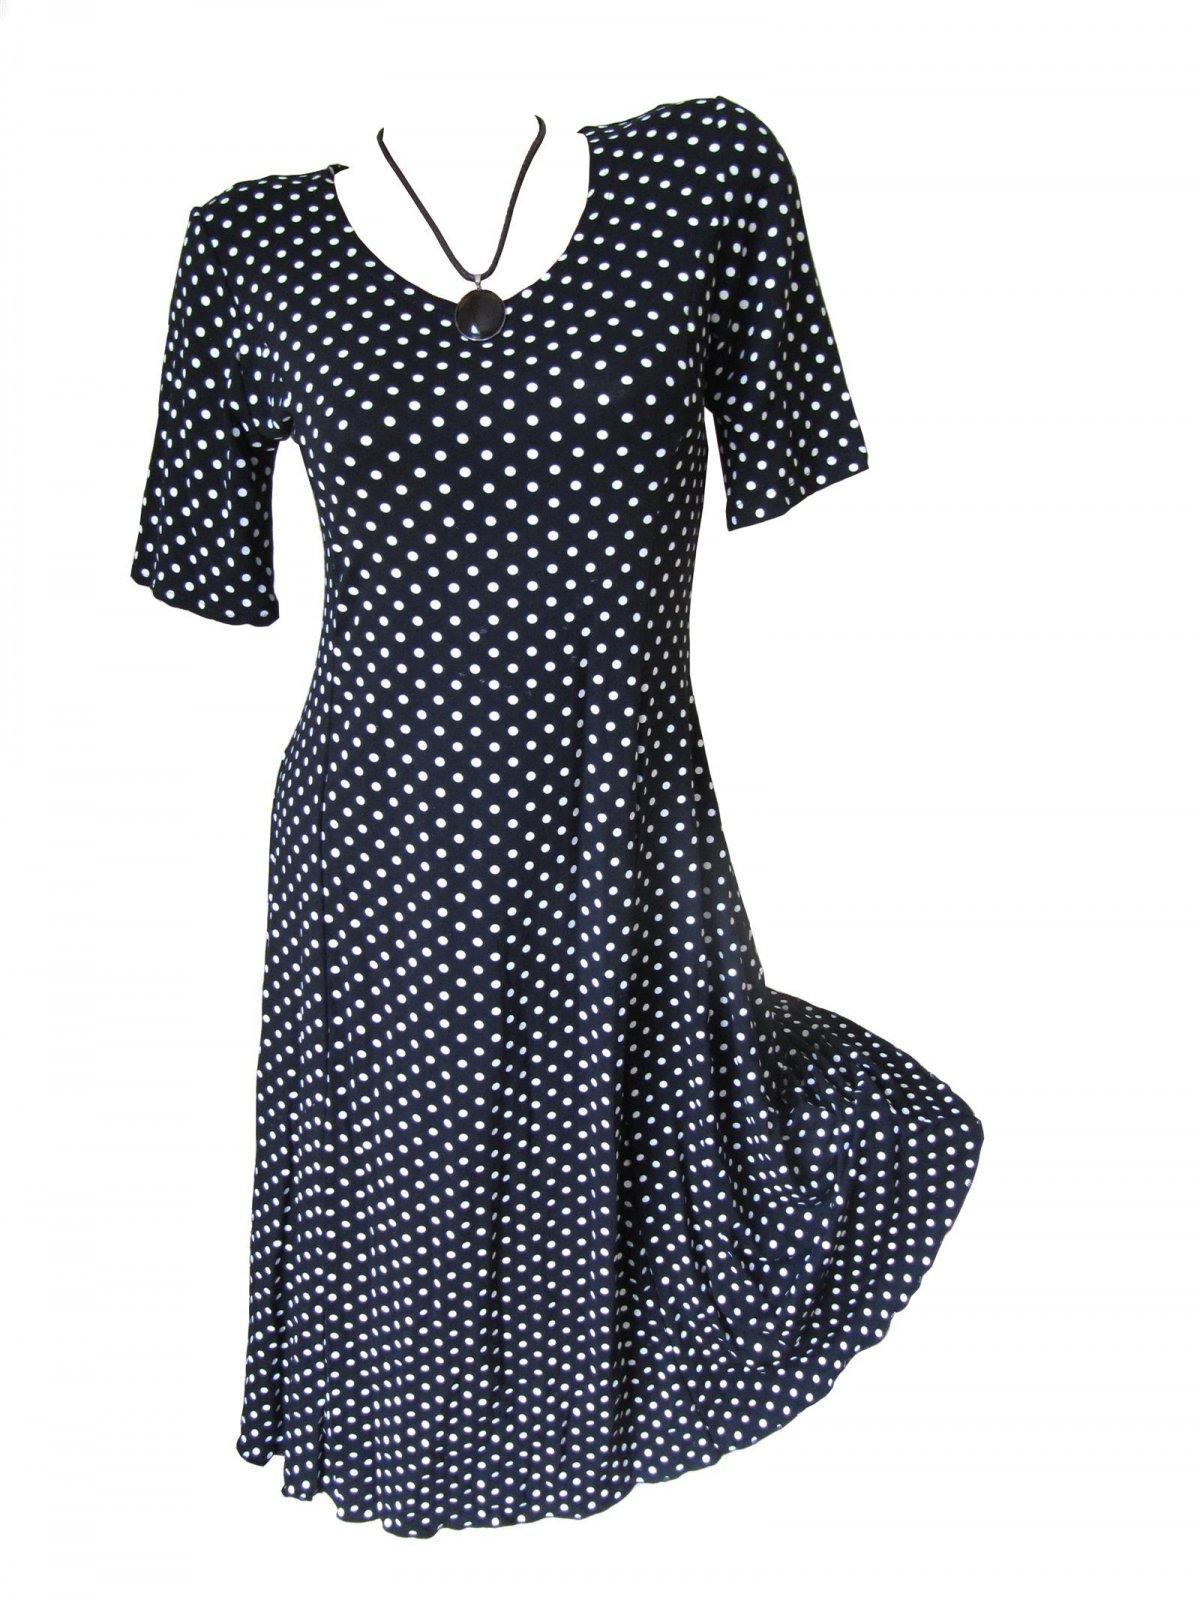 Sommer Kleid Tunika Punkte Kurzarm Wadenlang Akb Mode